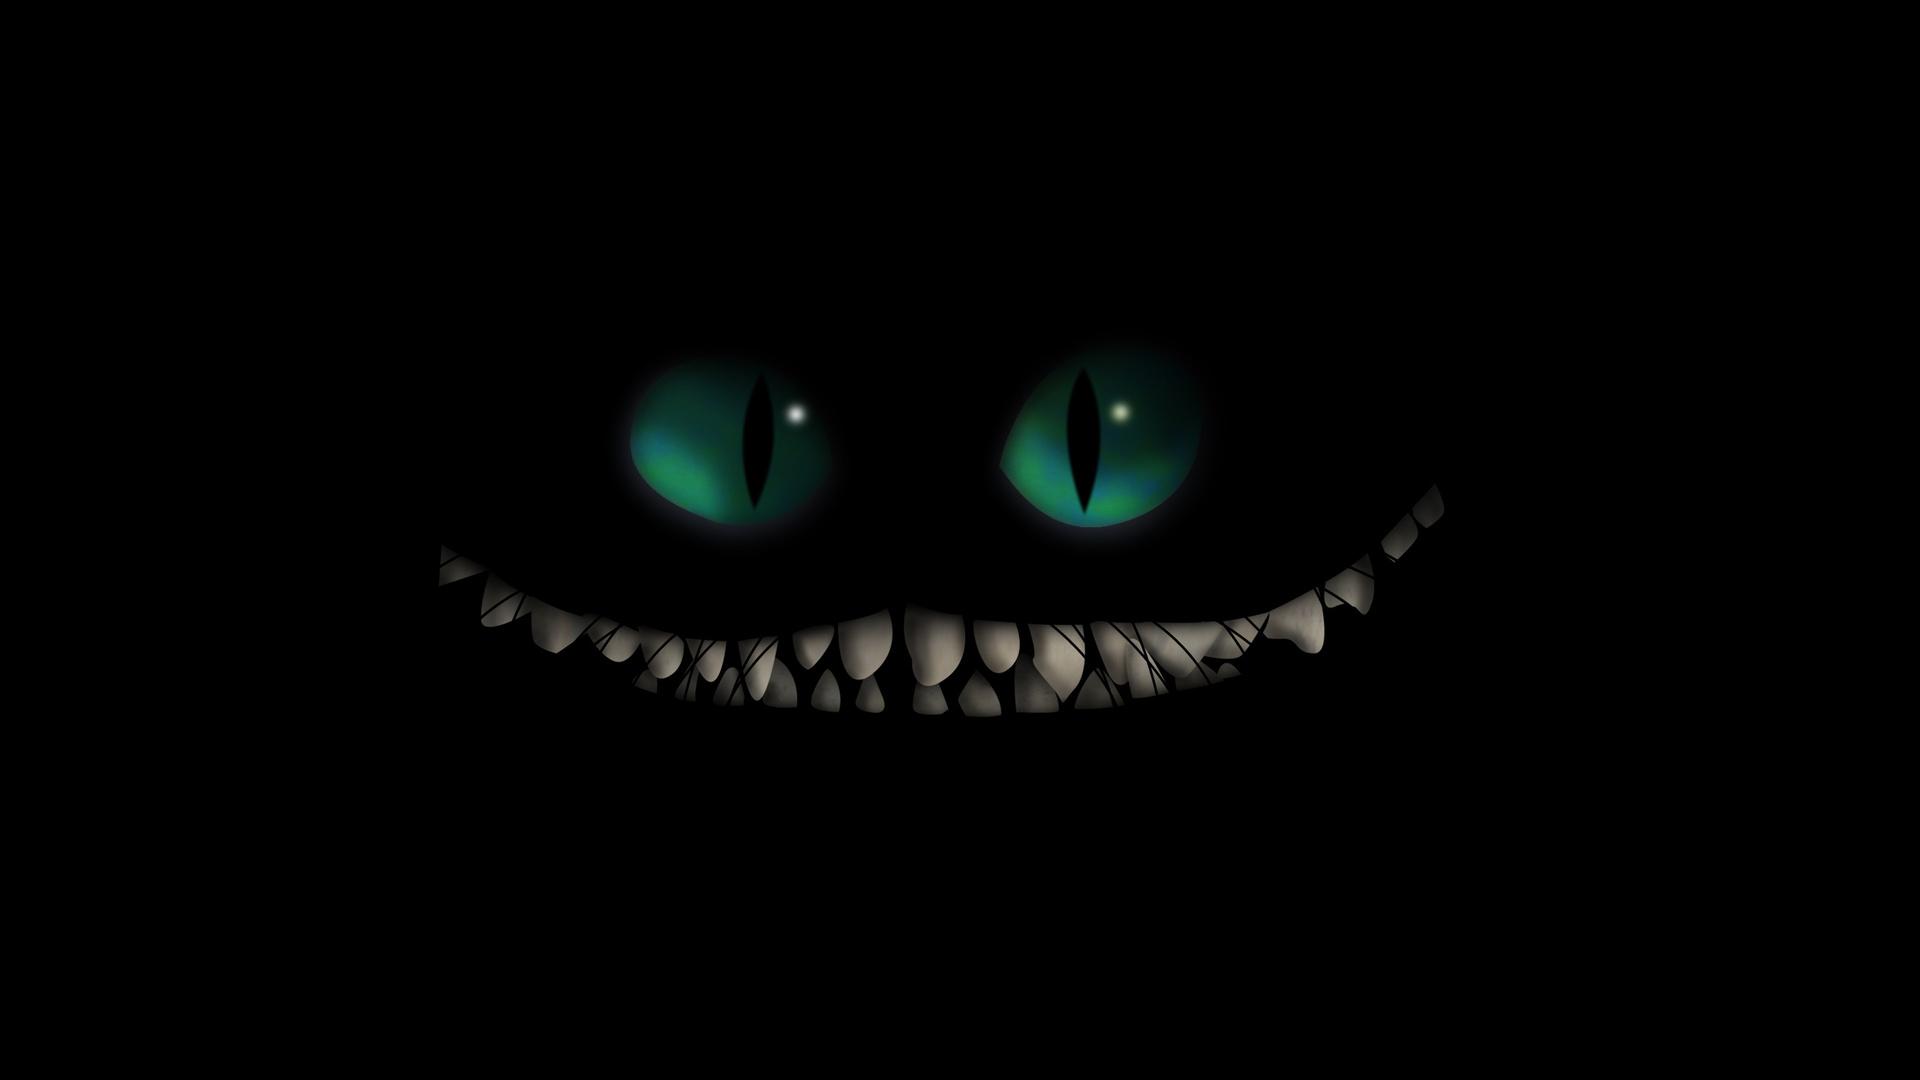 улыбка чеширского кота фото